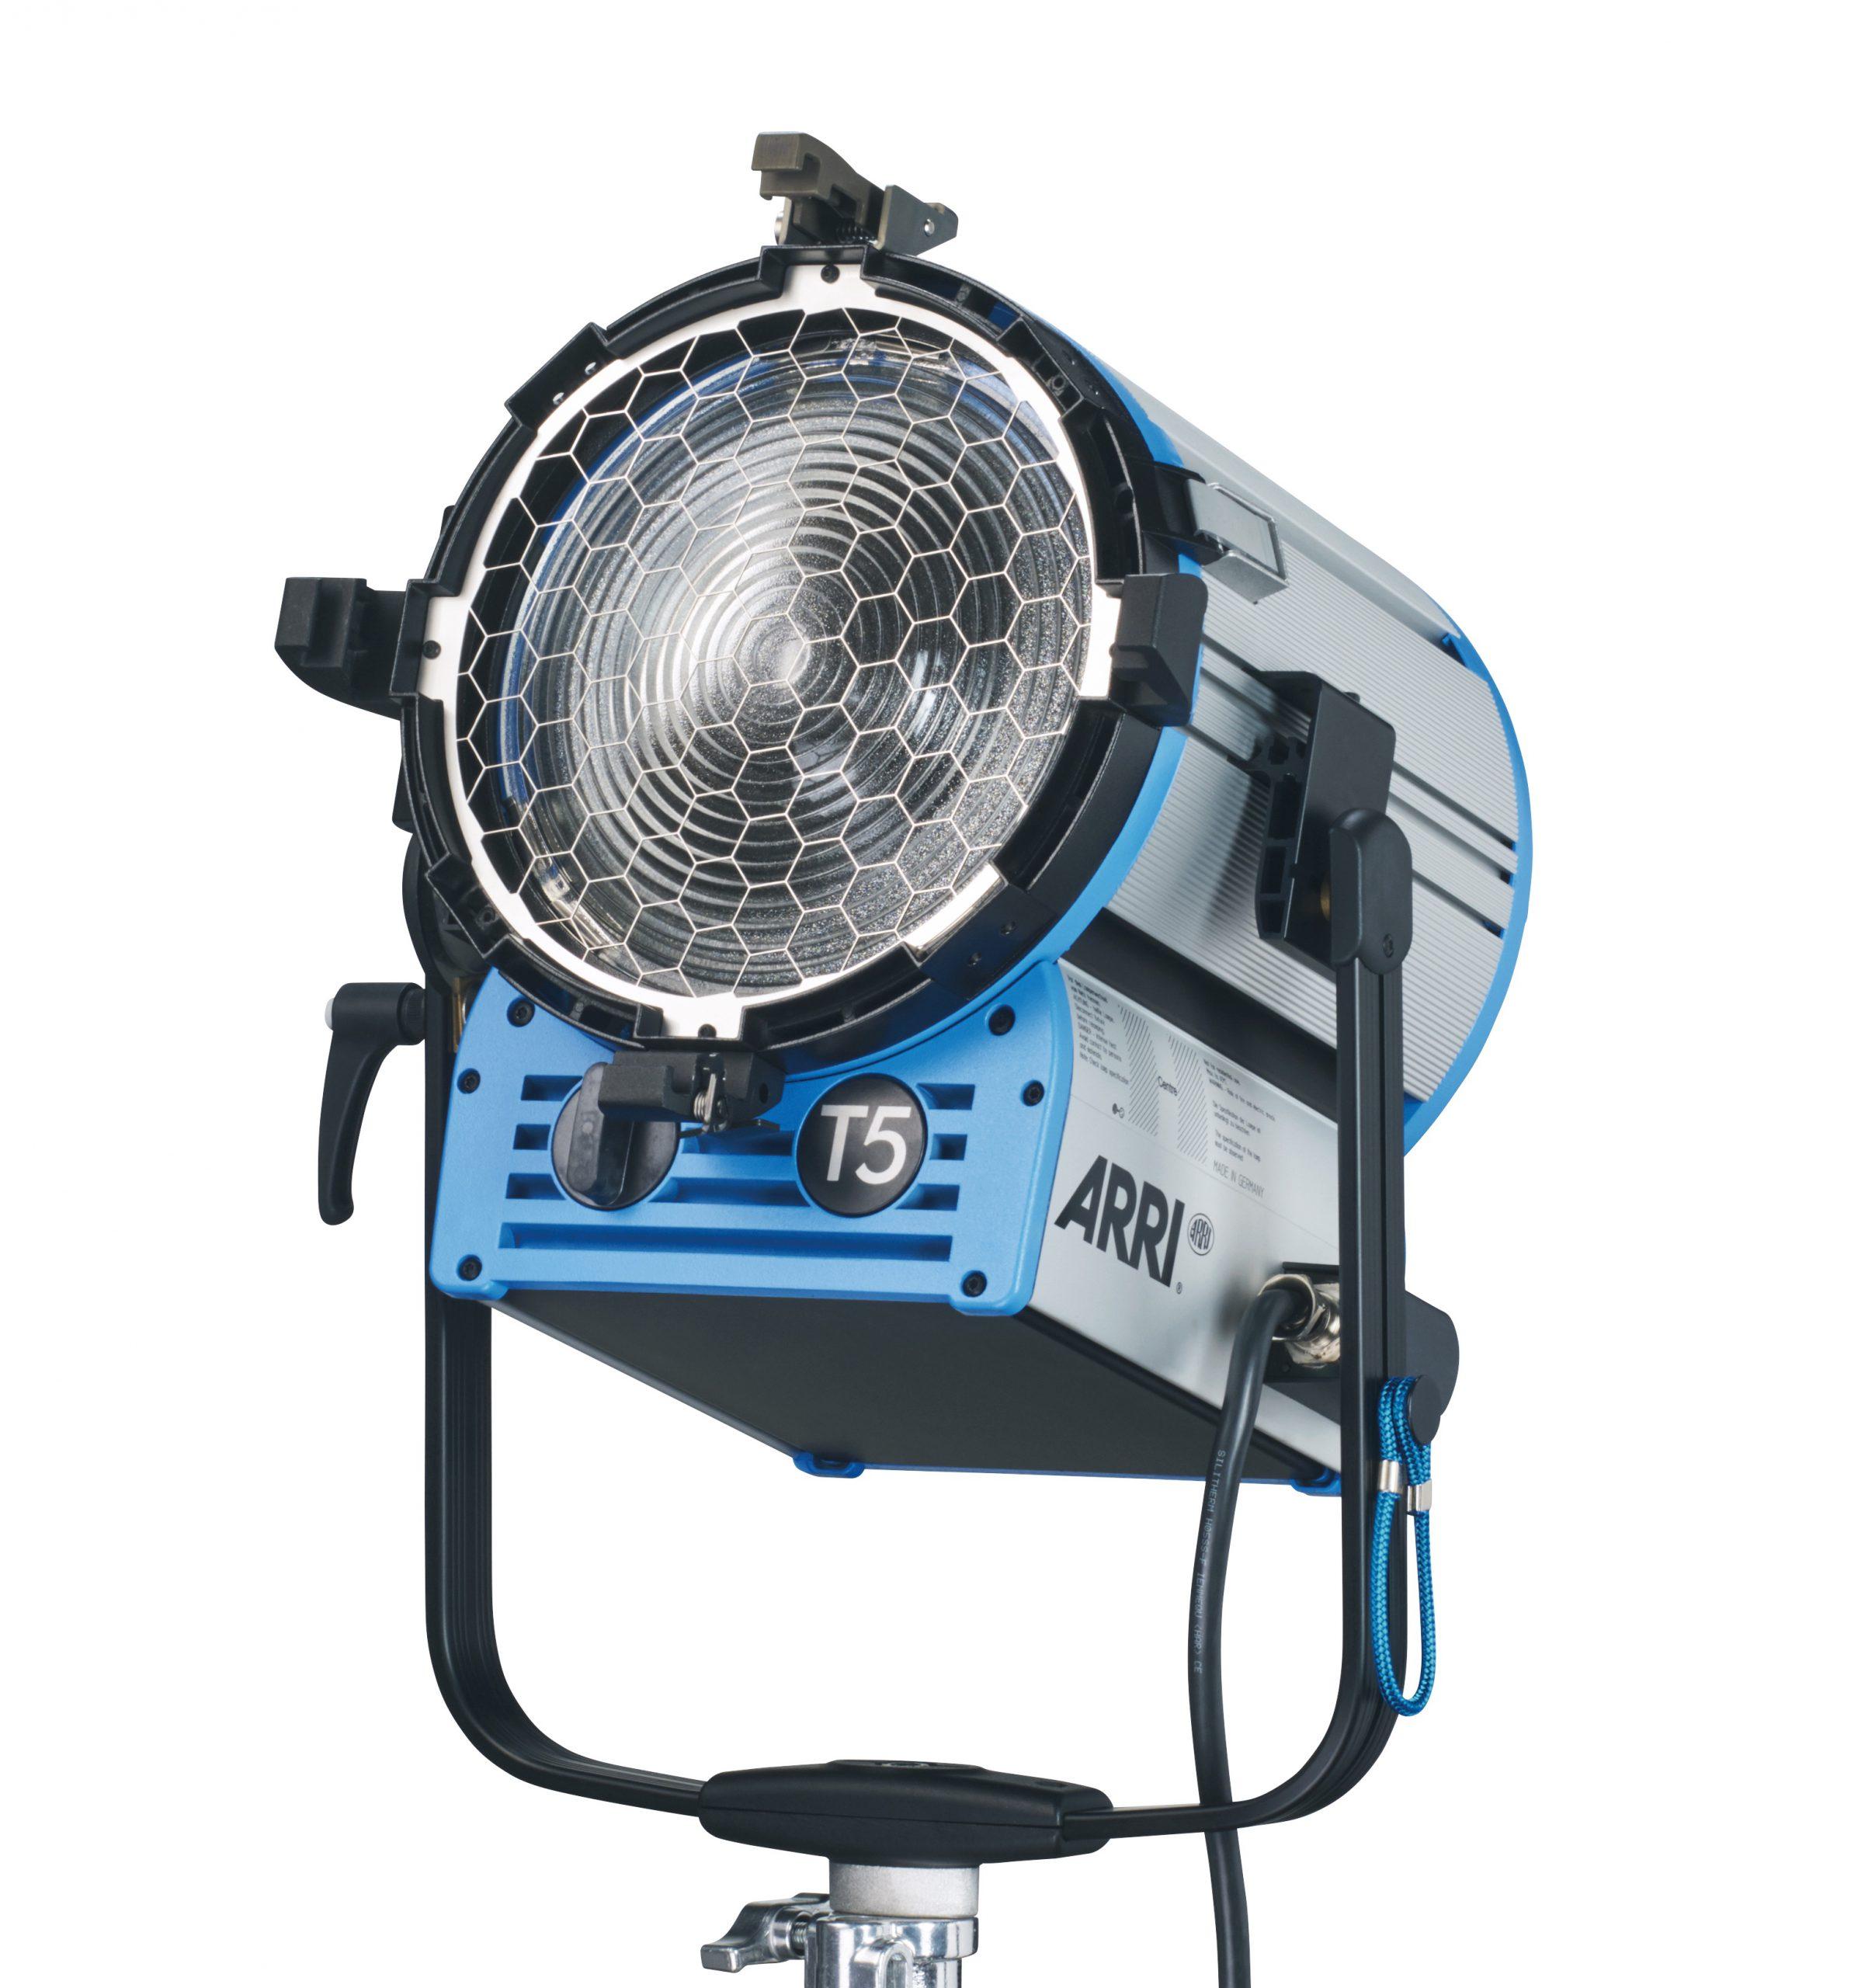 ARRI True Blue T5 MAN. 5000W, 4-Leaf Barndoor, Filter Frame